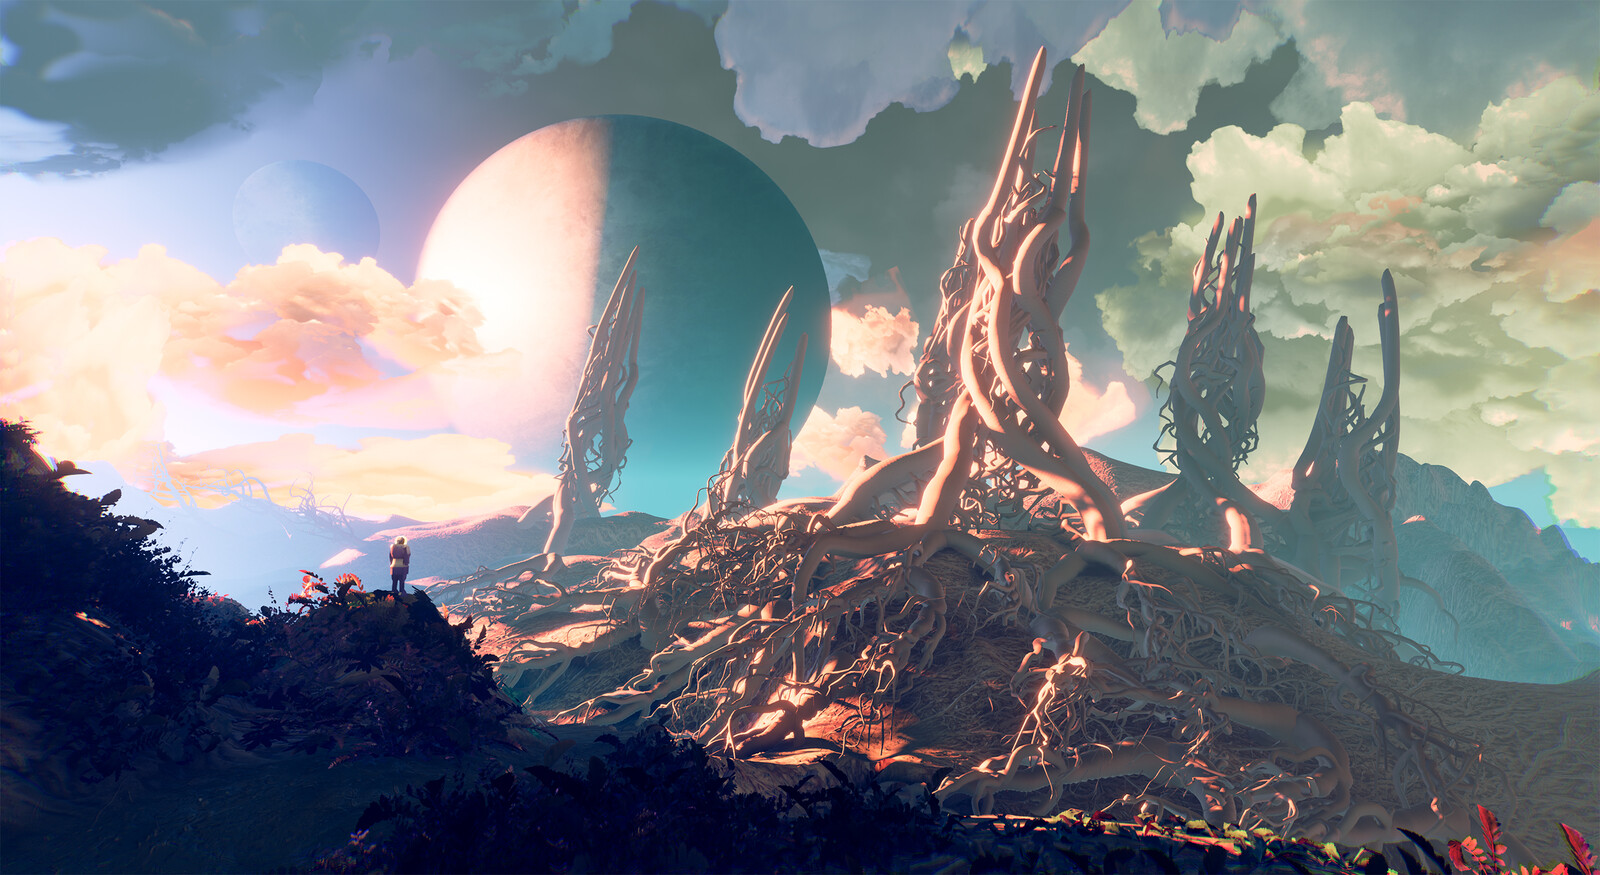 Ginseng Caves Entrance - ArtStation Challenge 'Grand Space Opera: Light Age'